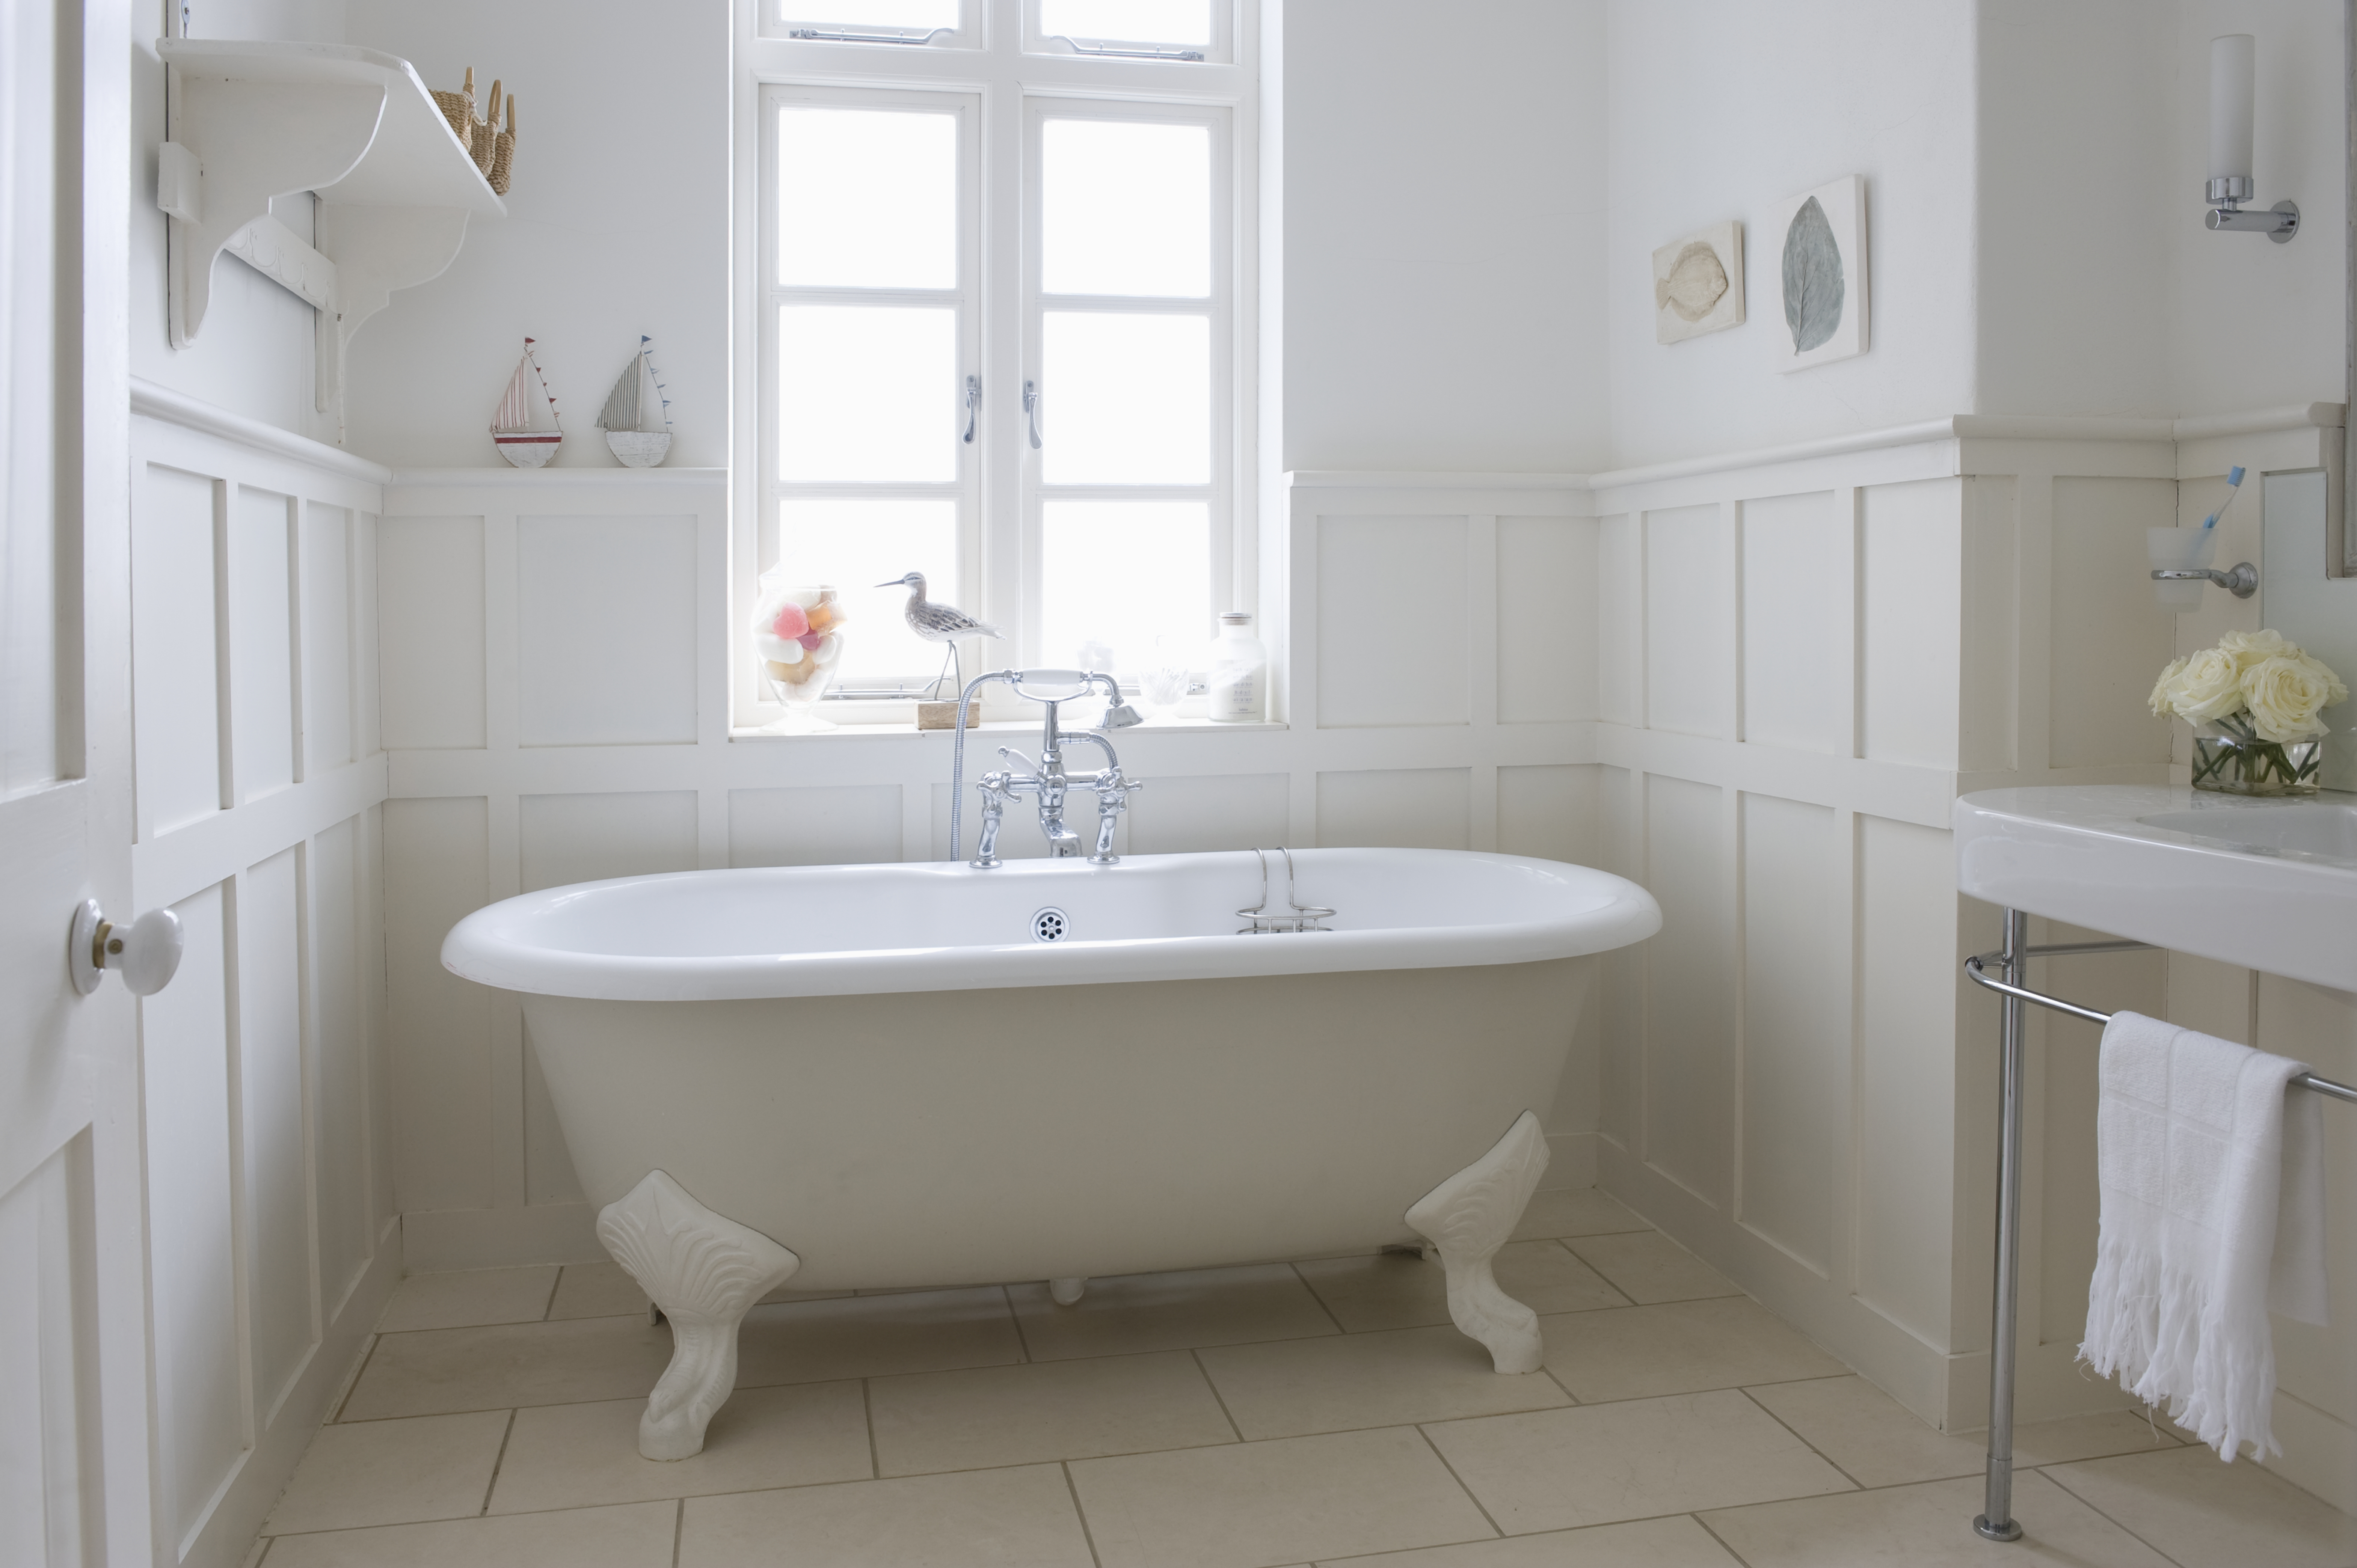 Small bathroom renovations Mountain View